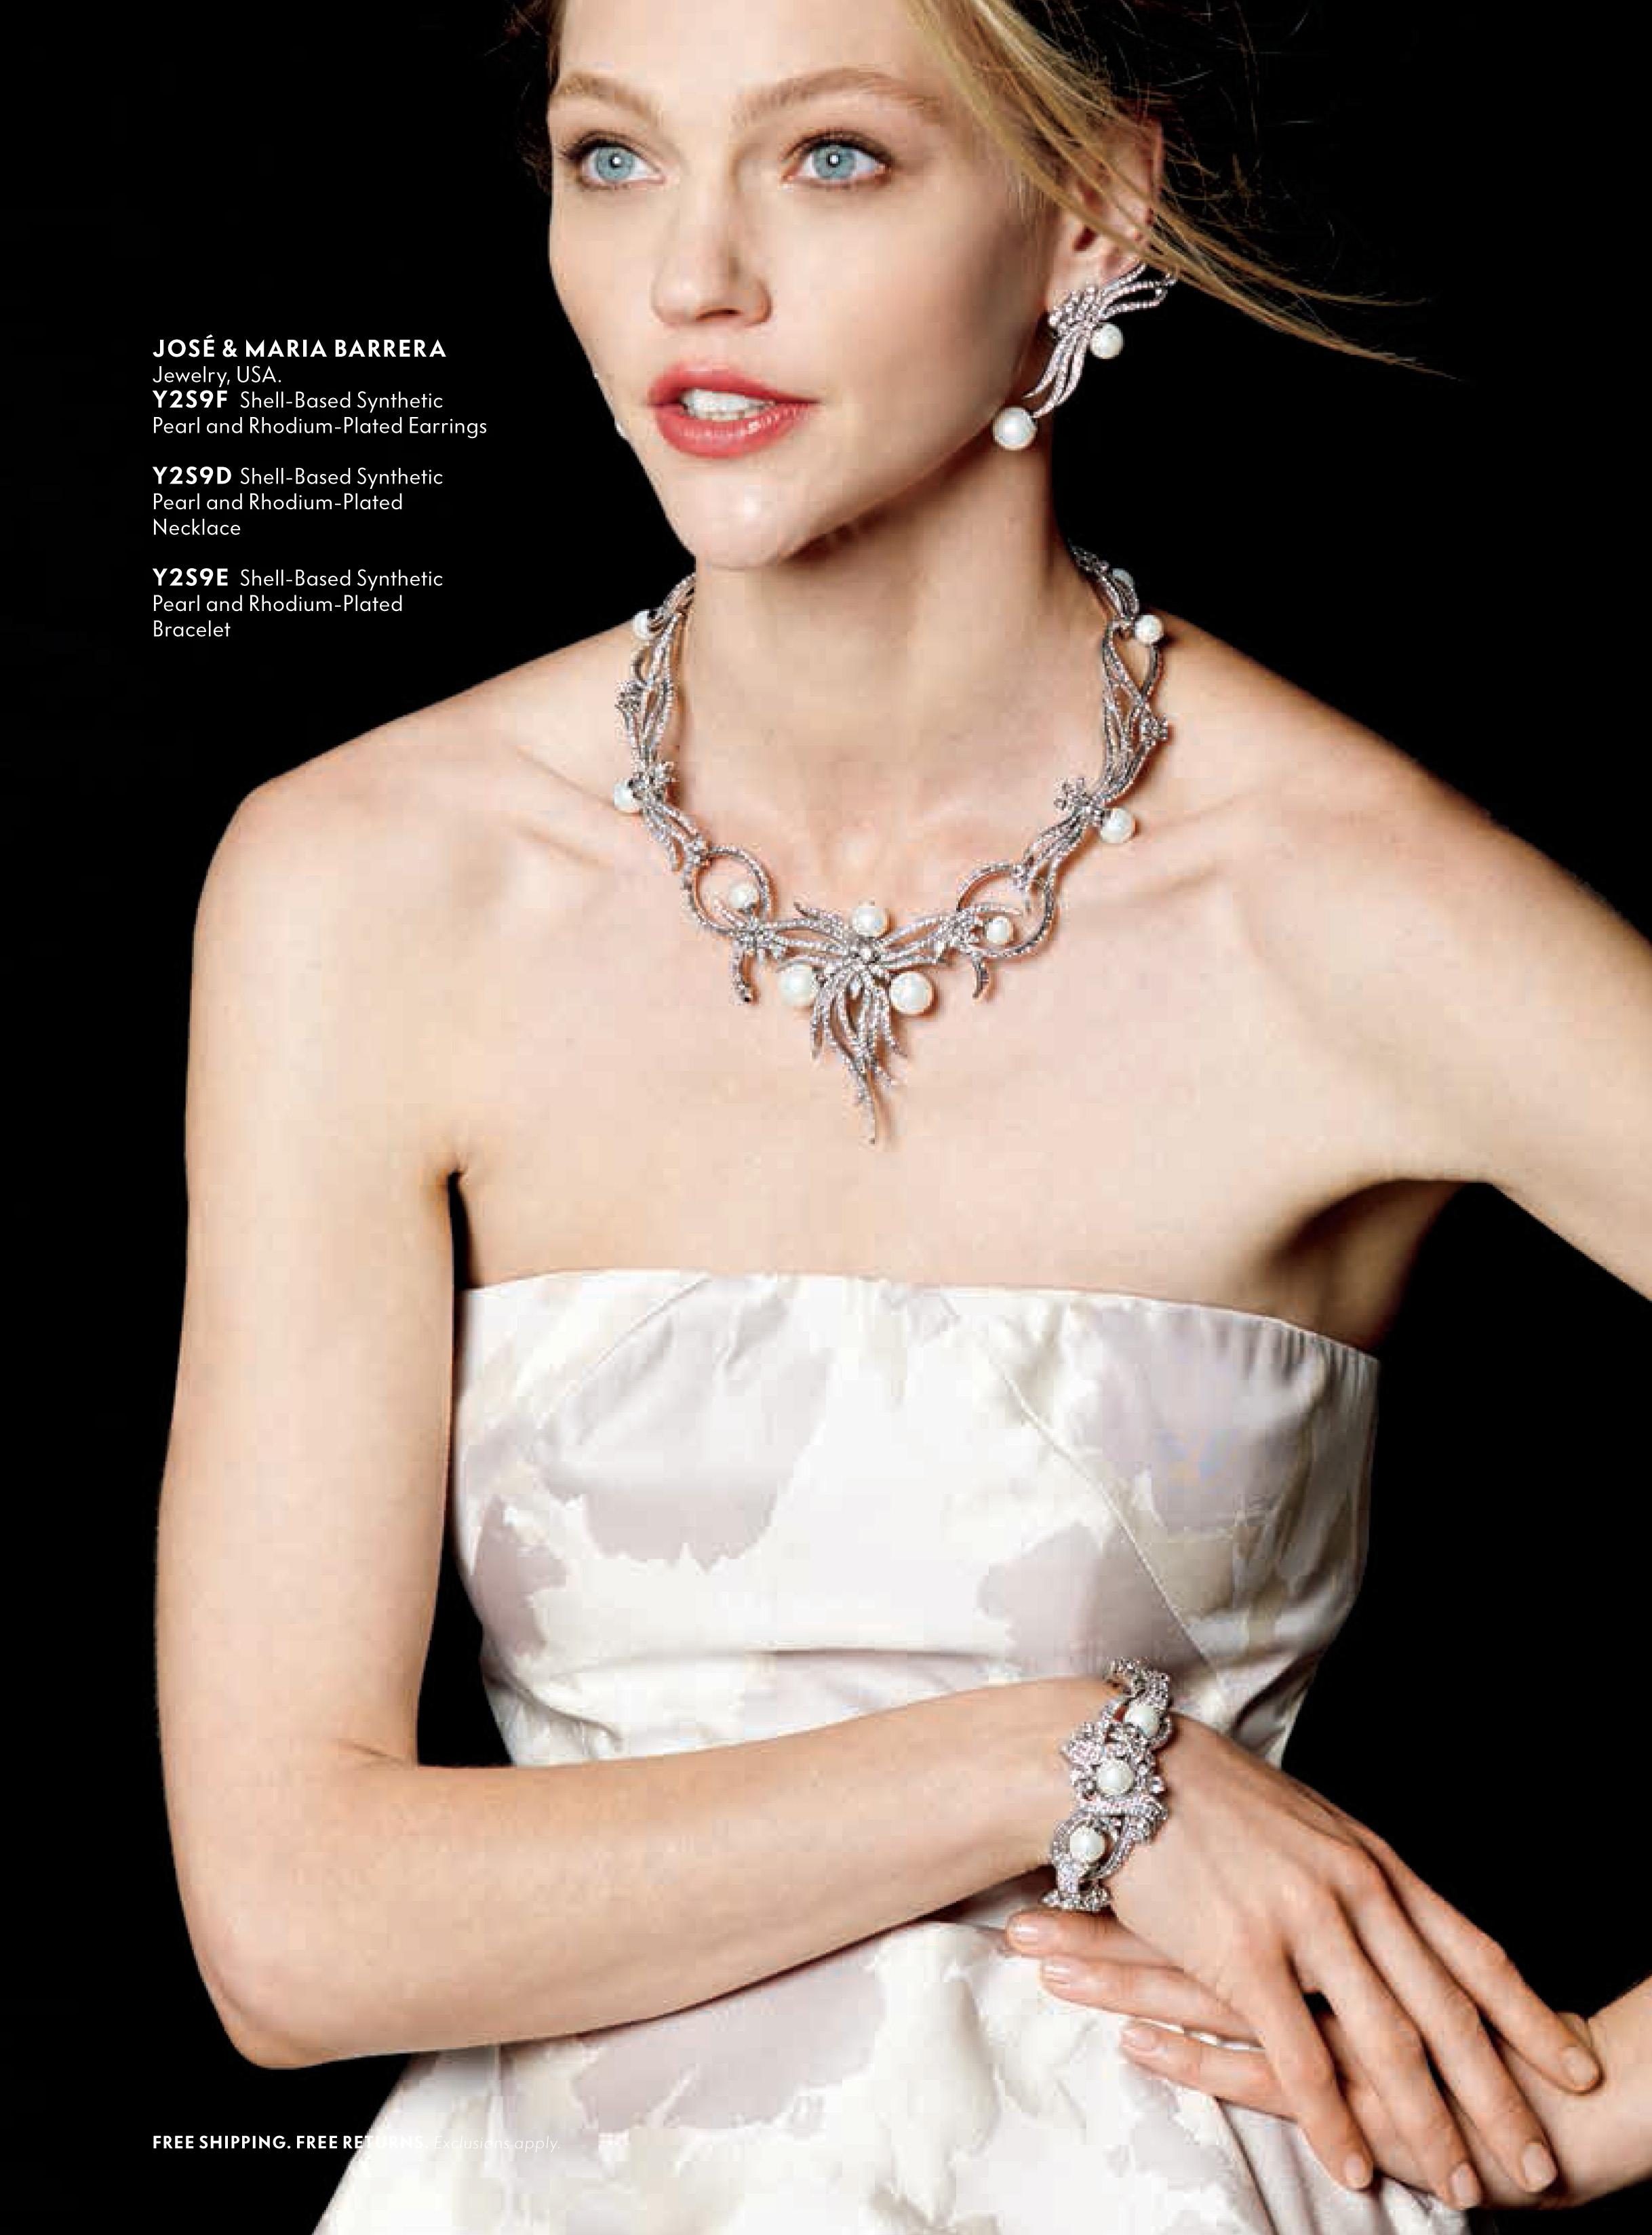 ad1fdbf96776 Neiman Marcus Christmas book 2015